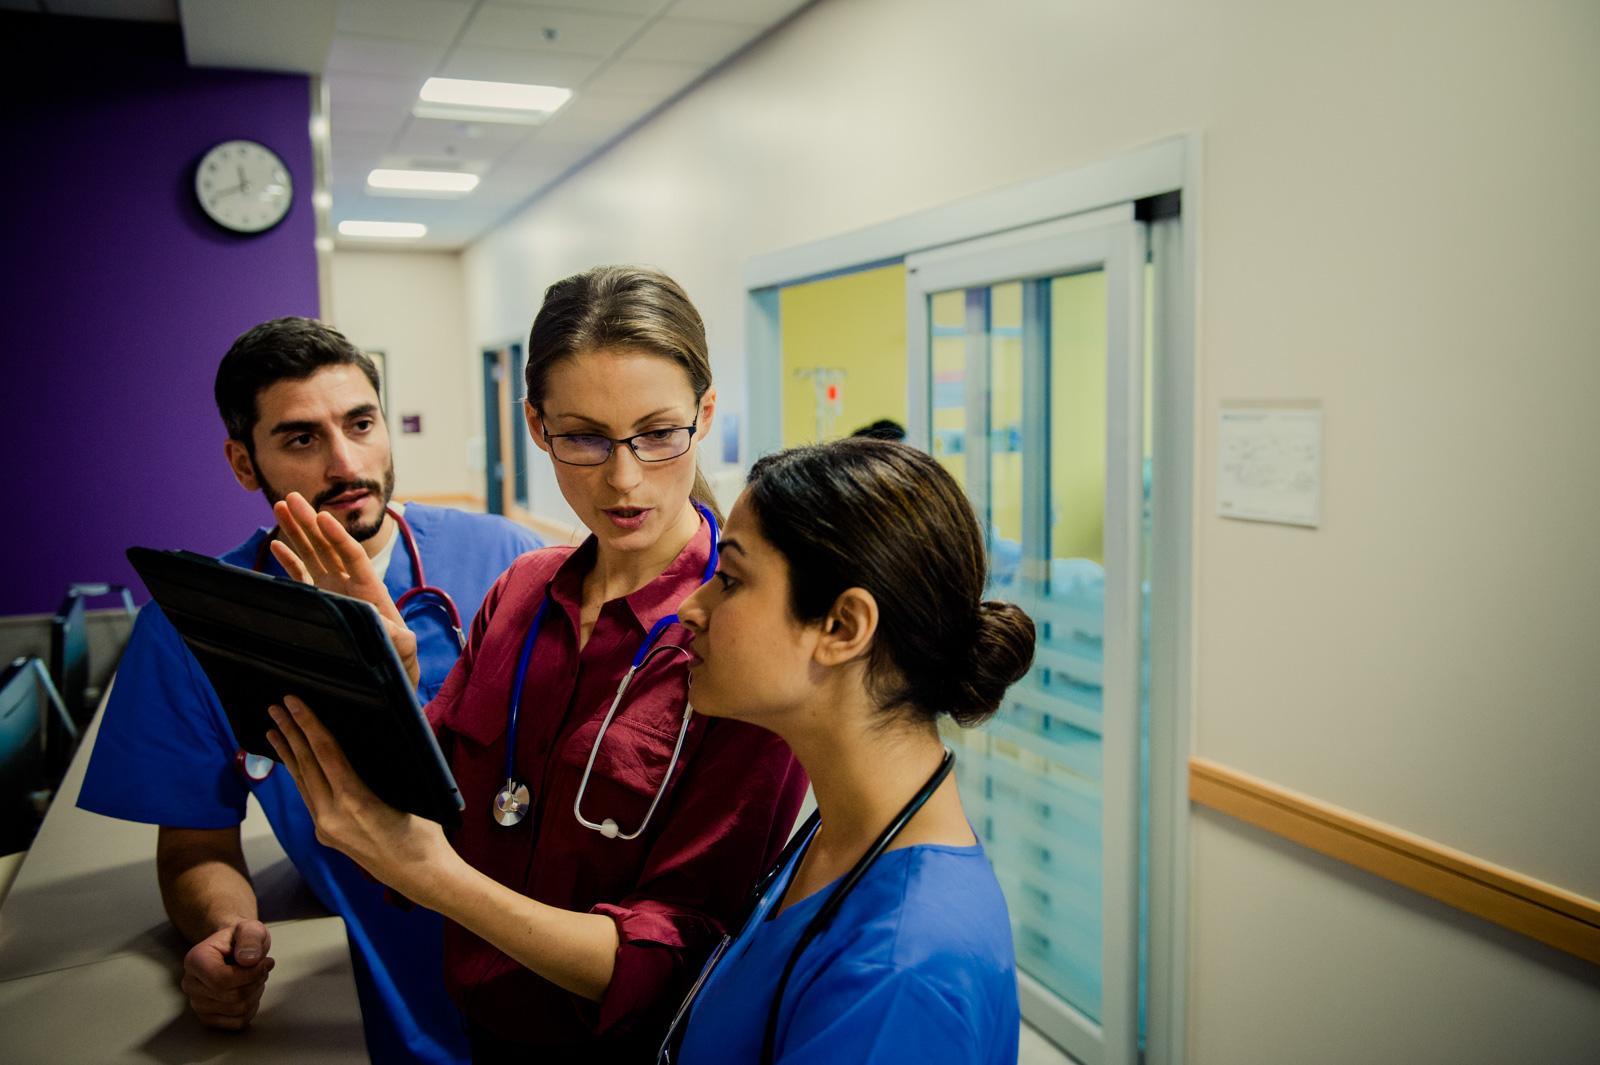 Three clinicians looking at computer